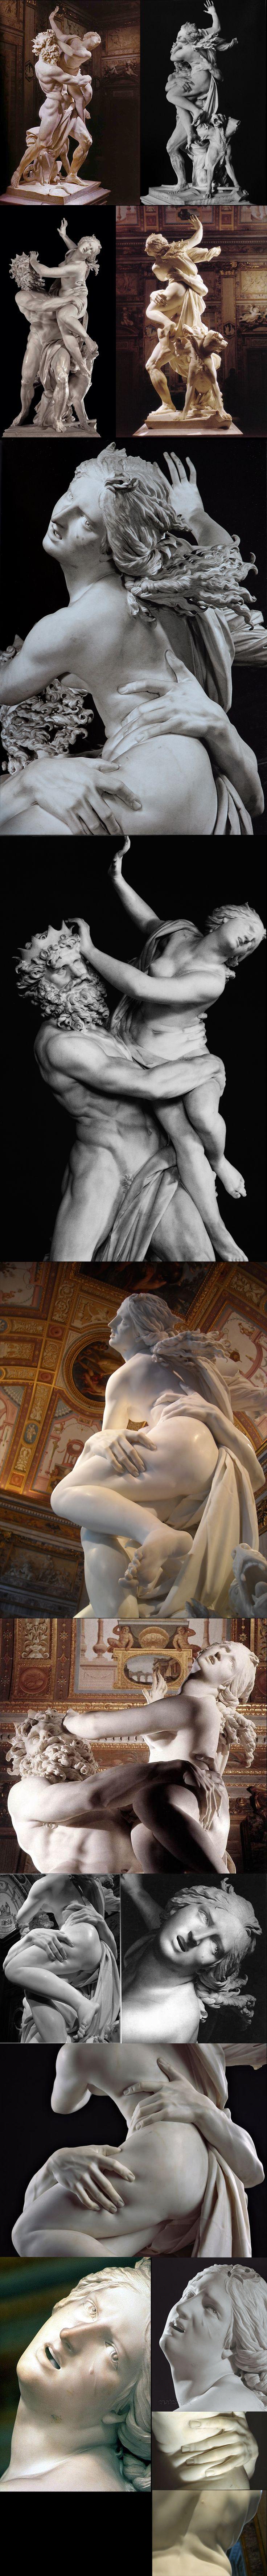 Lorenzo Bernini Pluton & Persefone. 1622. Galleria Borghese, Rome